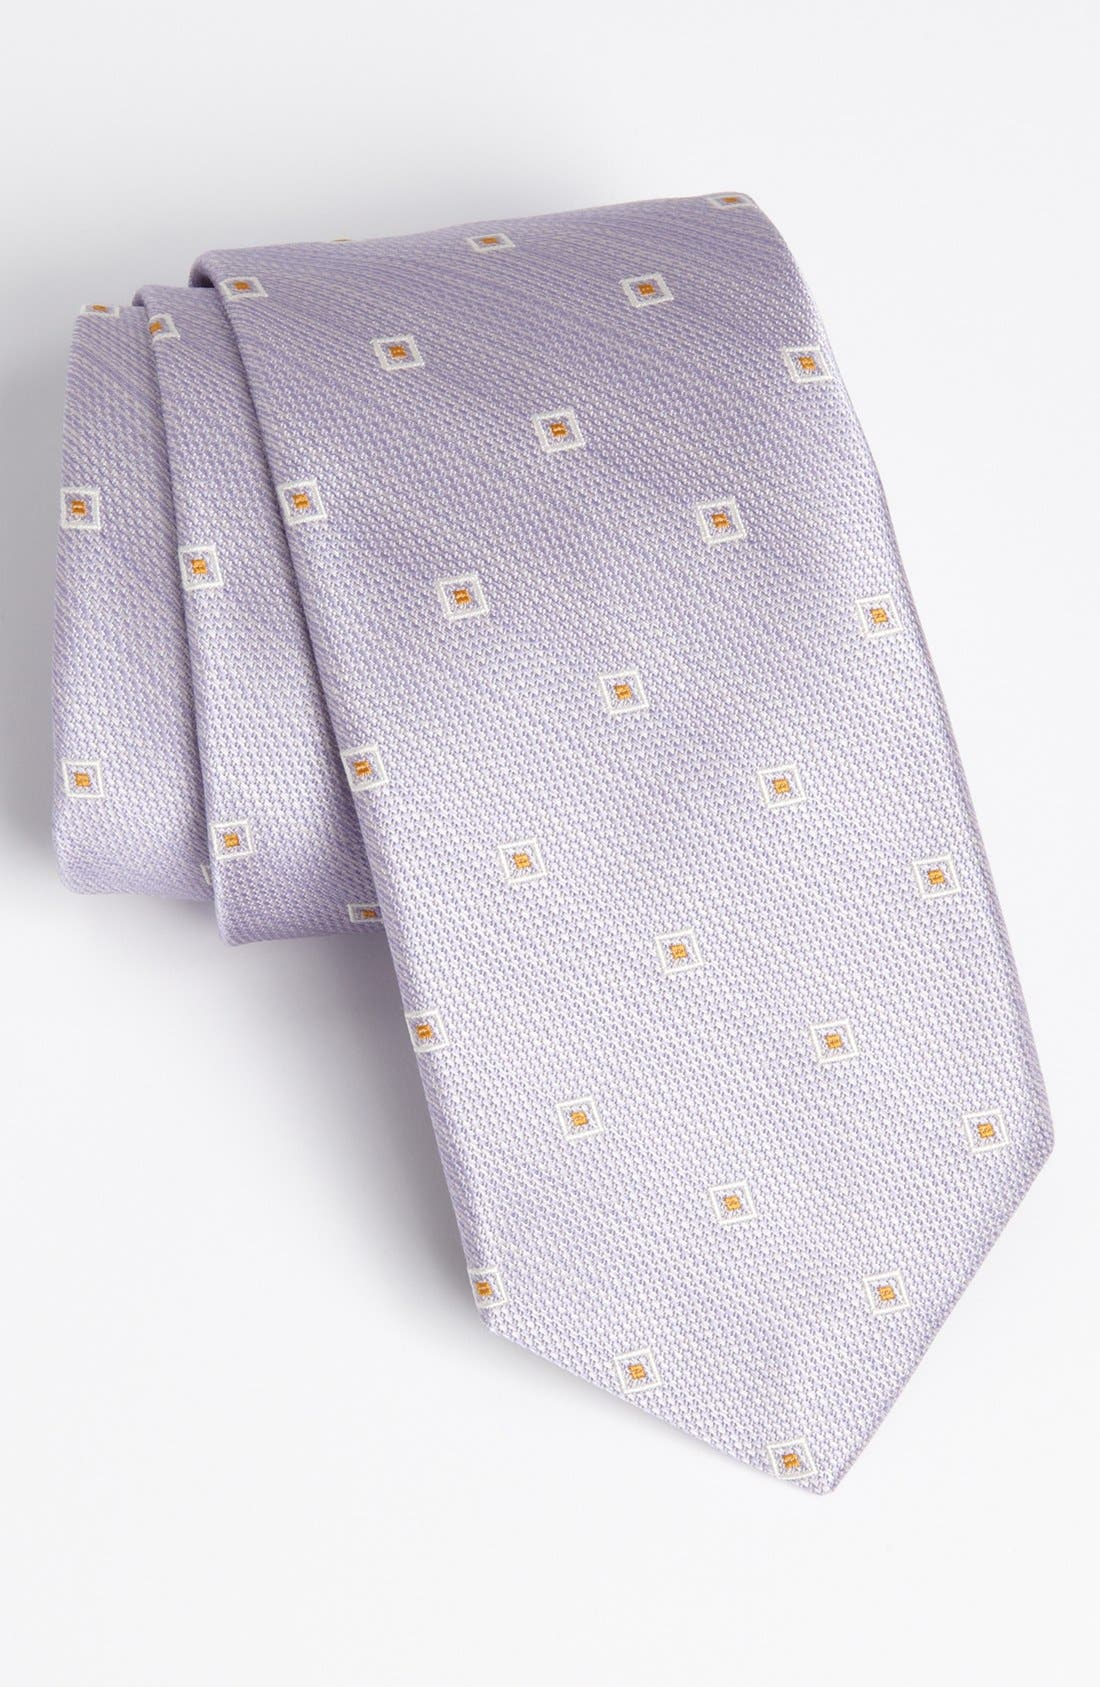 Alternate Image 1 Selected - Robert Talbott Woven Tie